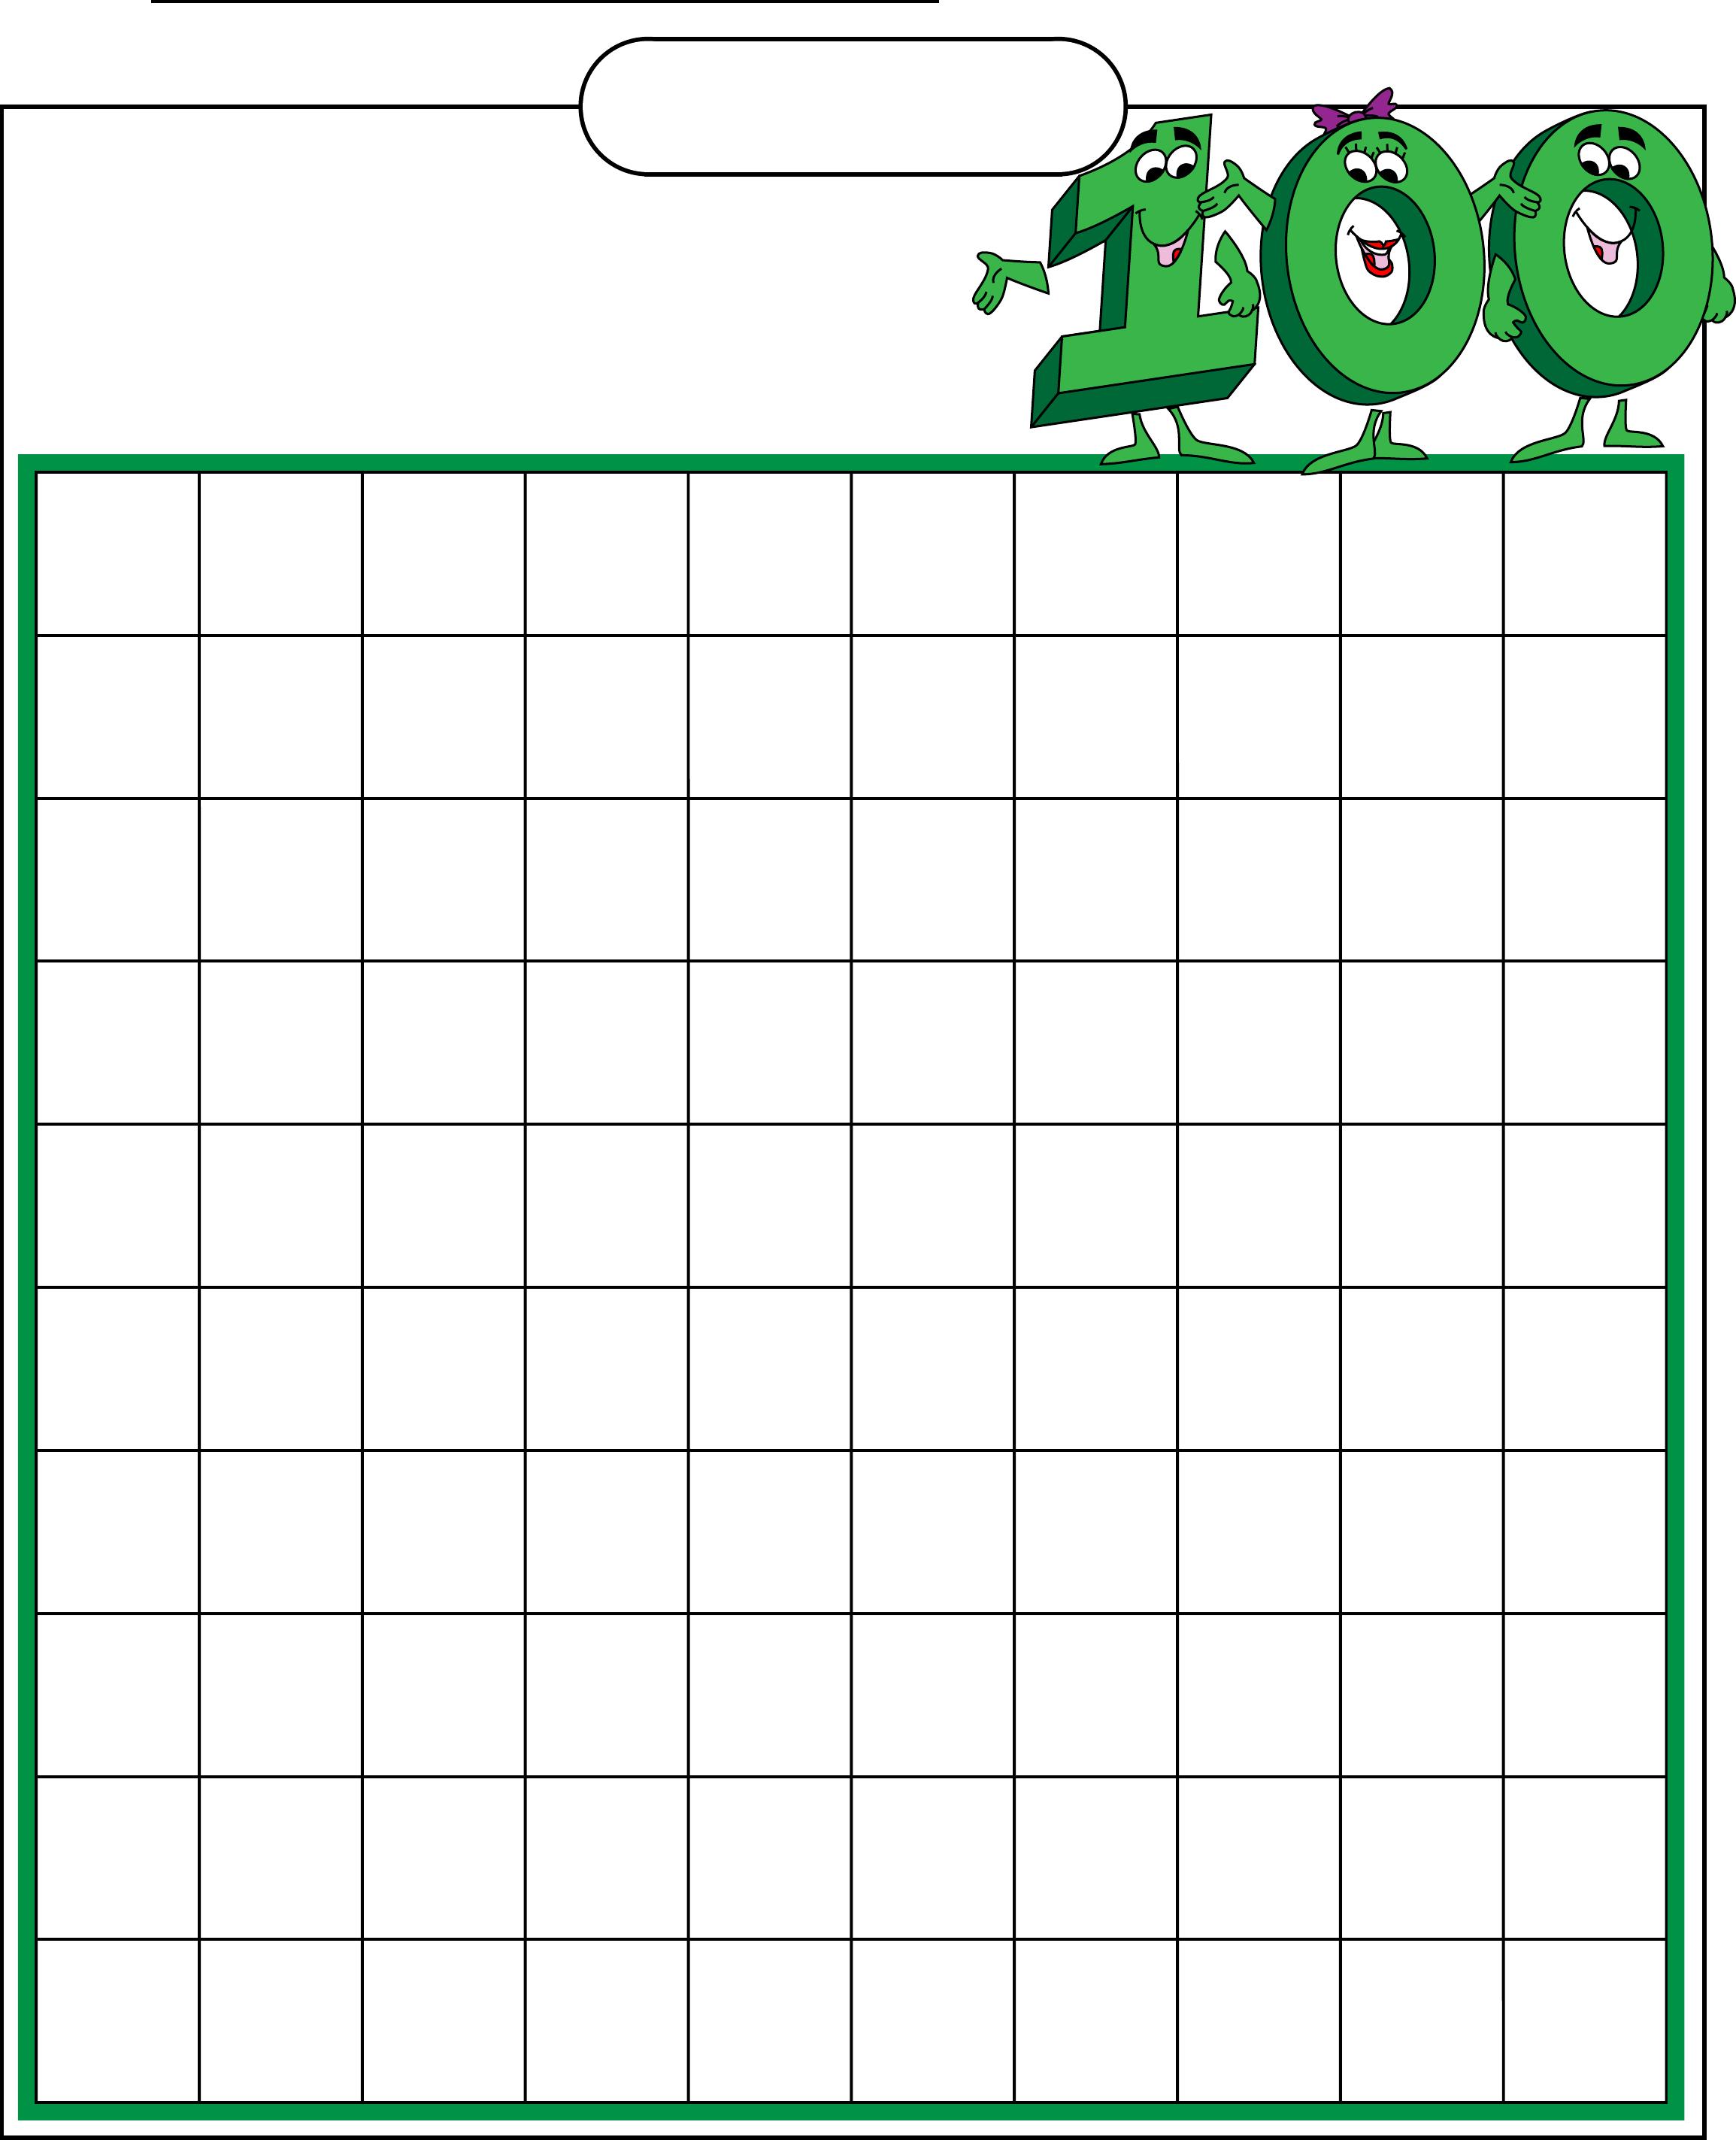 Math : Blank Hundreds Chart Blank Hundreds Chart To 50. Blank - Free Printable Hundreds Chart To 120